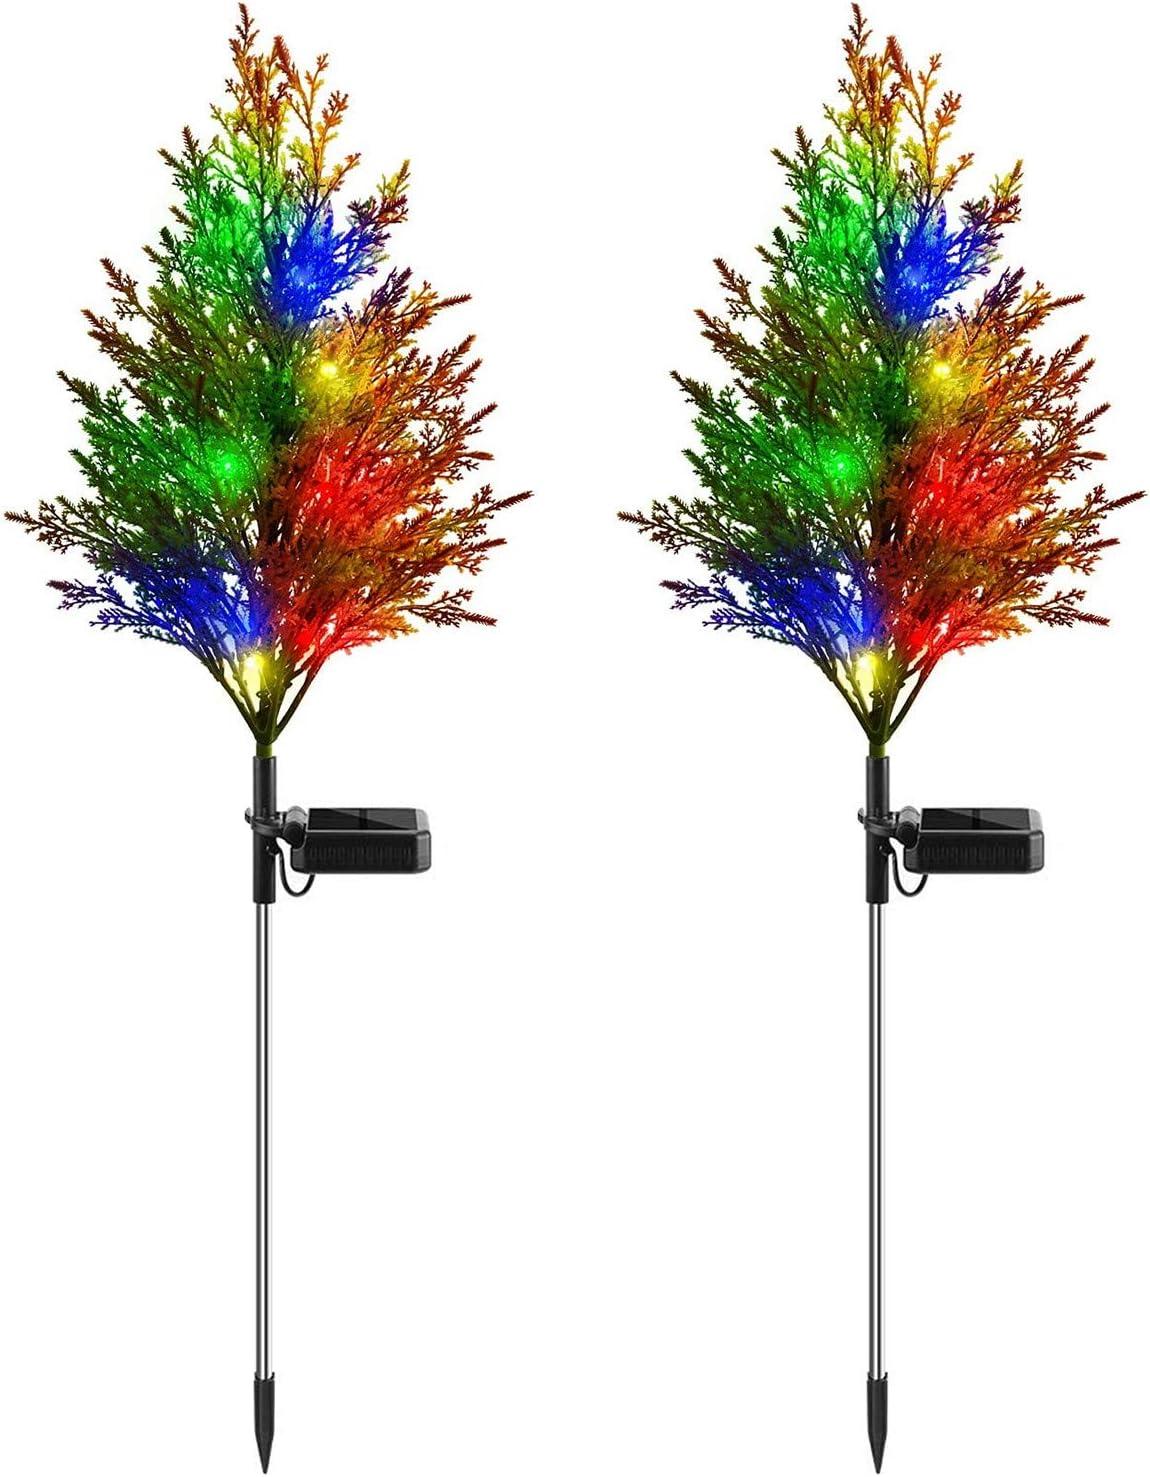 iRonrain Solar Garden Lights Pine Modes Tree Christmas Popular brand discount 2